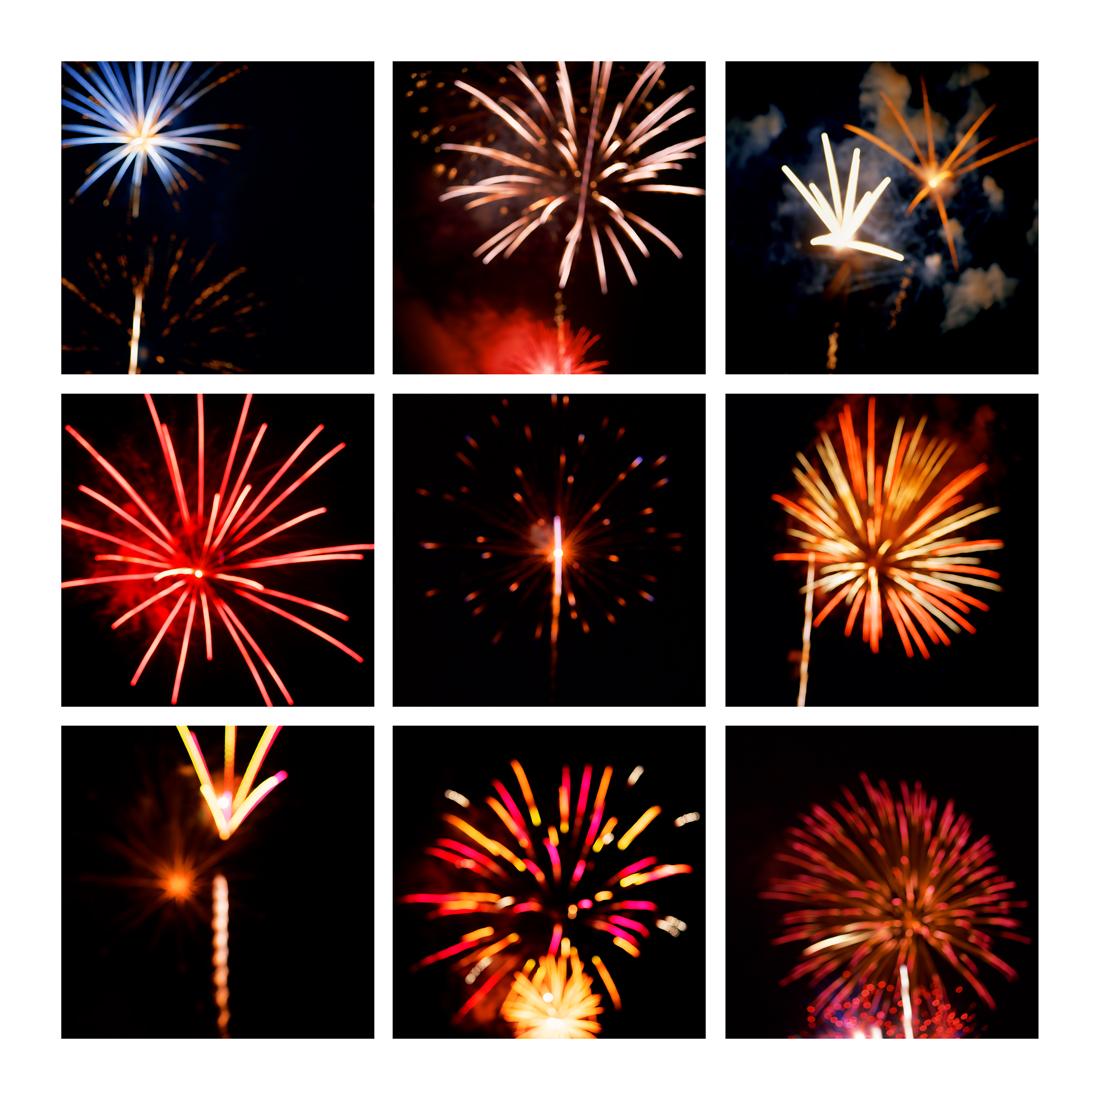 Fireworks #7, 2019 (2008-2019)